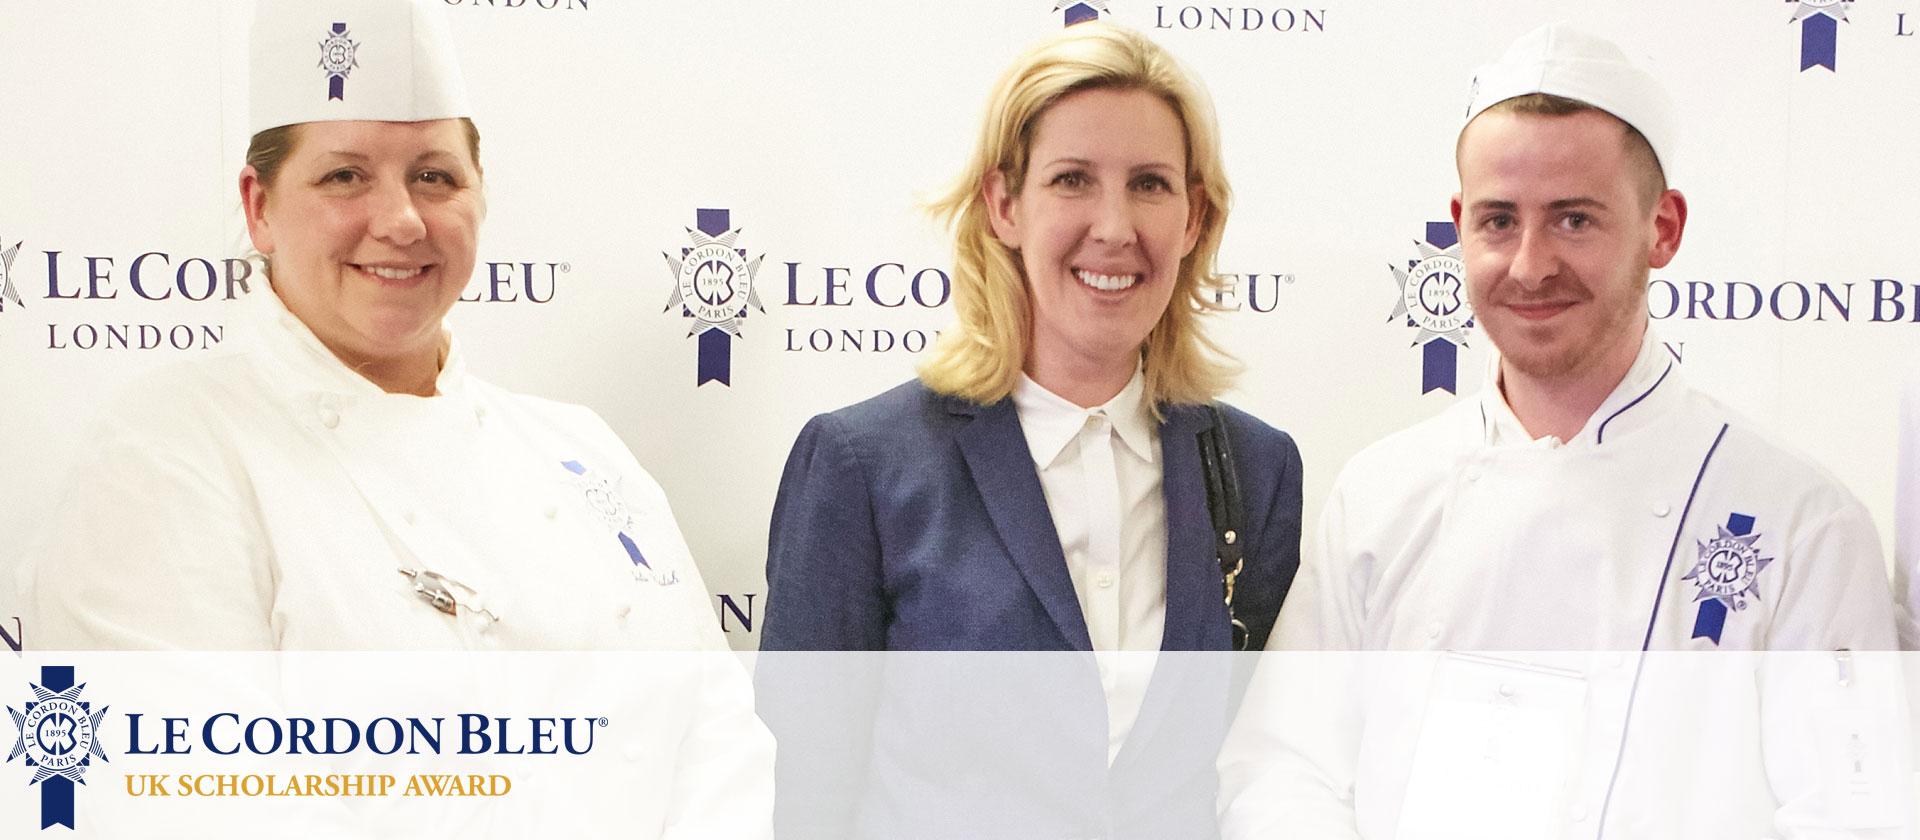 Keiron Murphy wins Le Cordon Bleu UK Scholarship Award with Clare Smyth